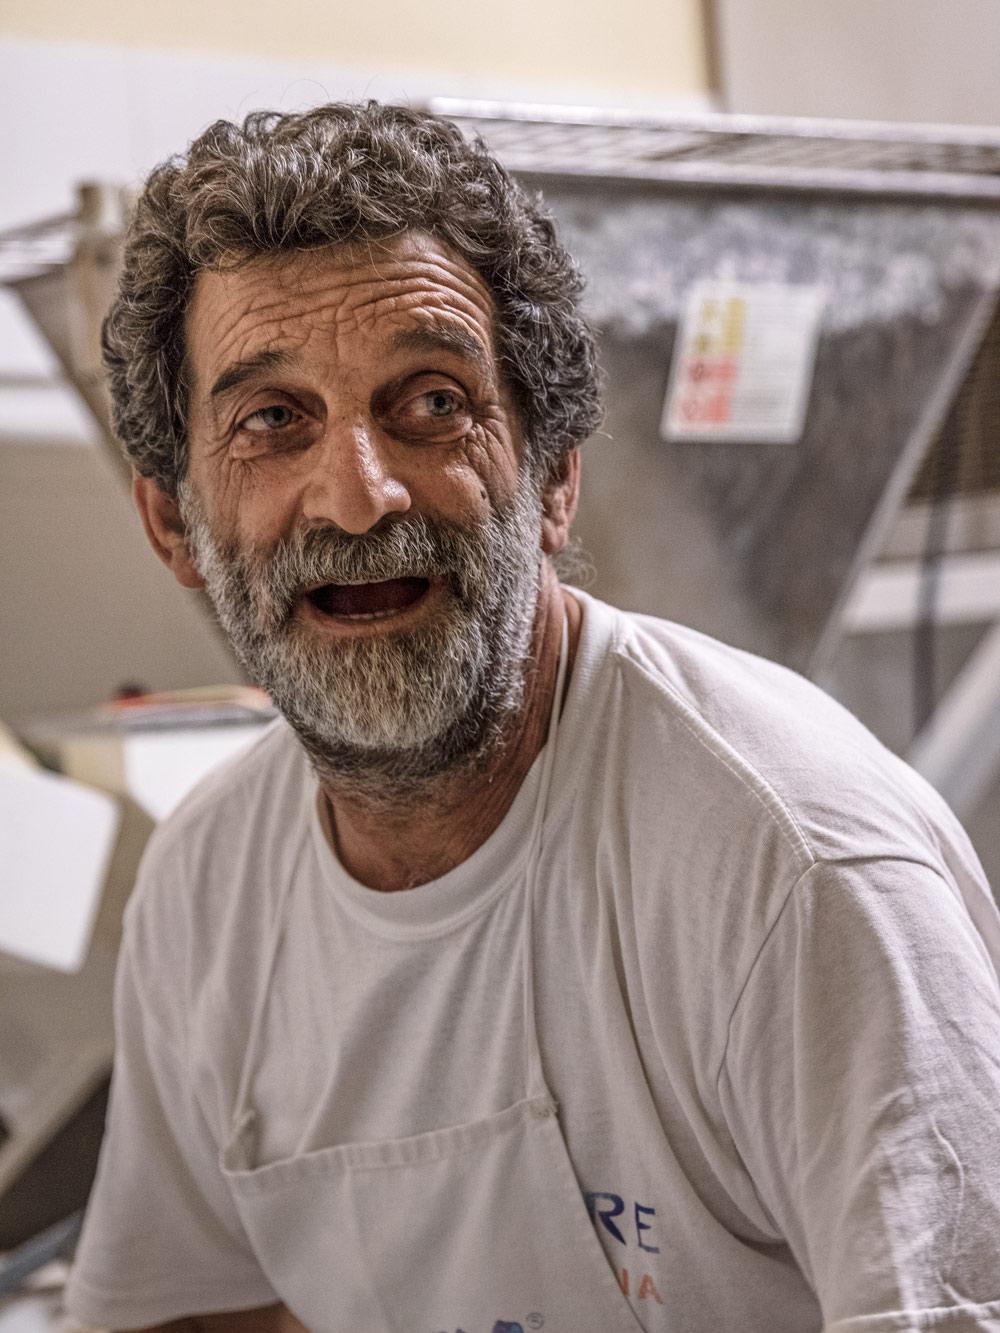 Gratteri Sicily, August 2019